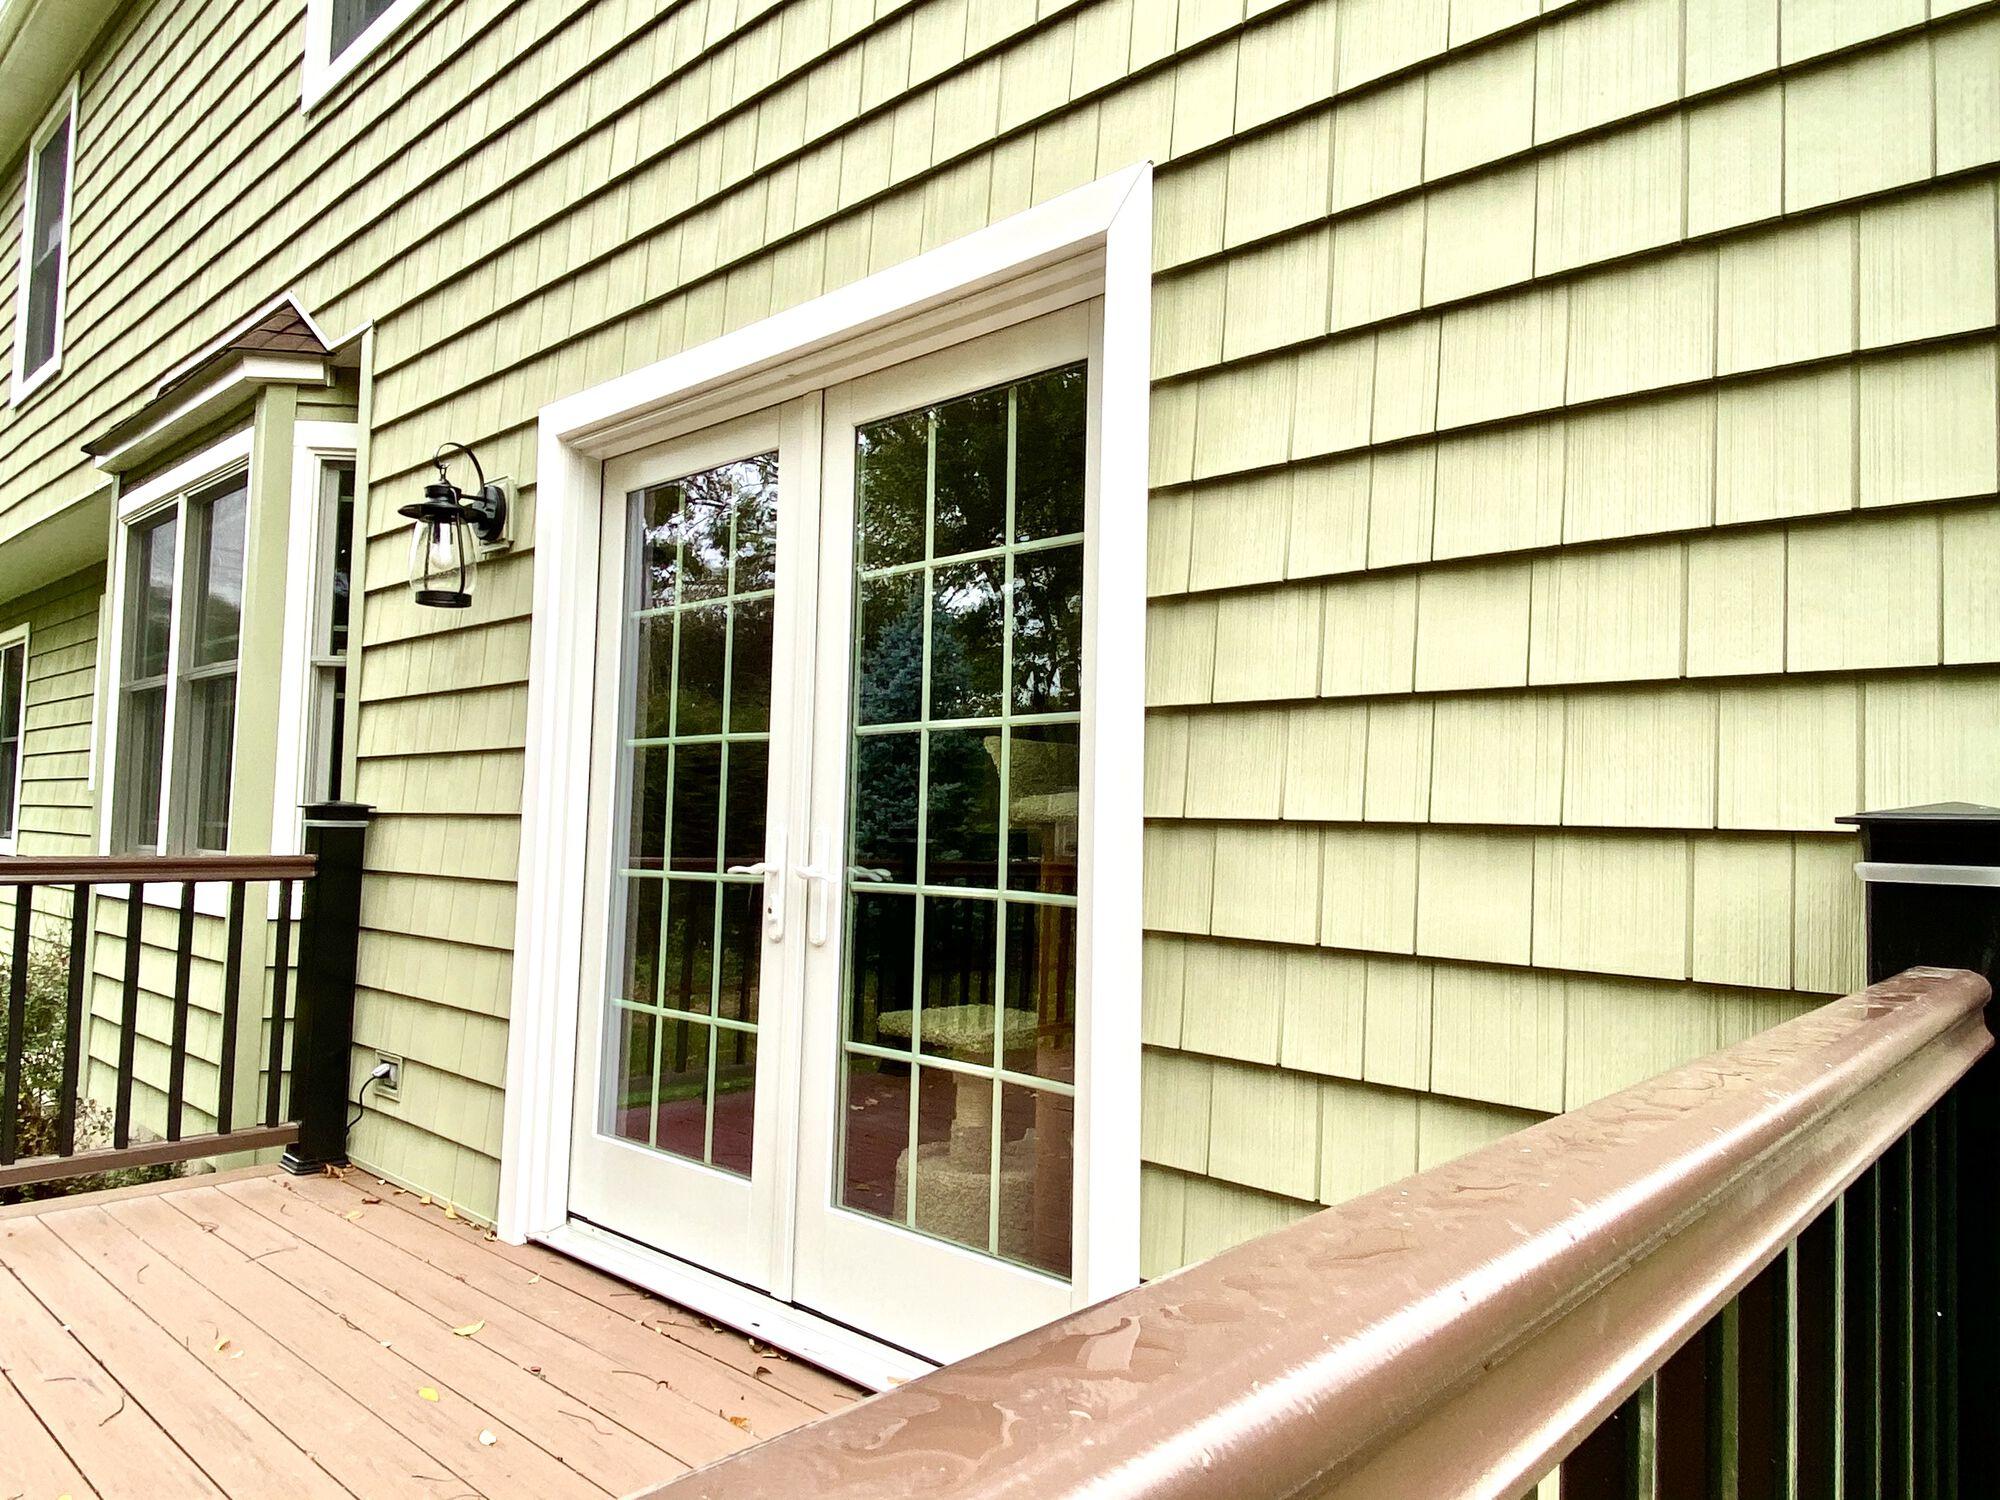 Pella Windows and Doors in Boonton, Morris County NJ